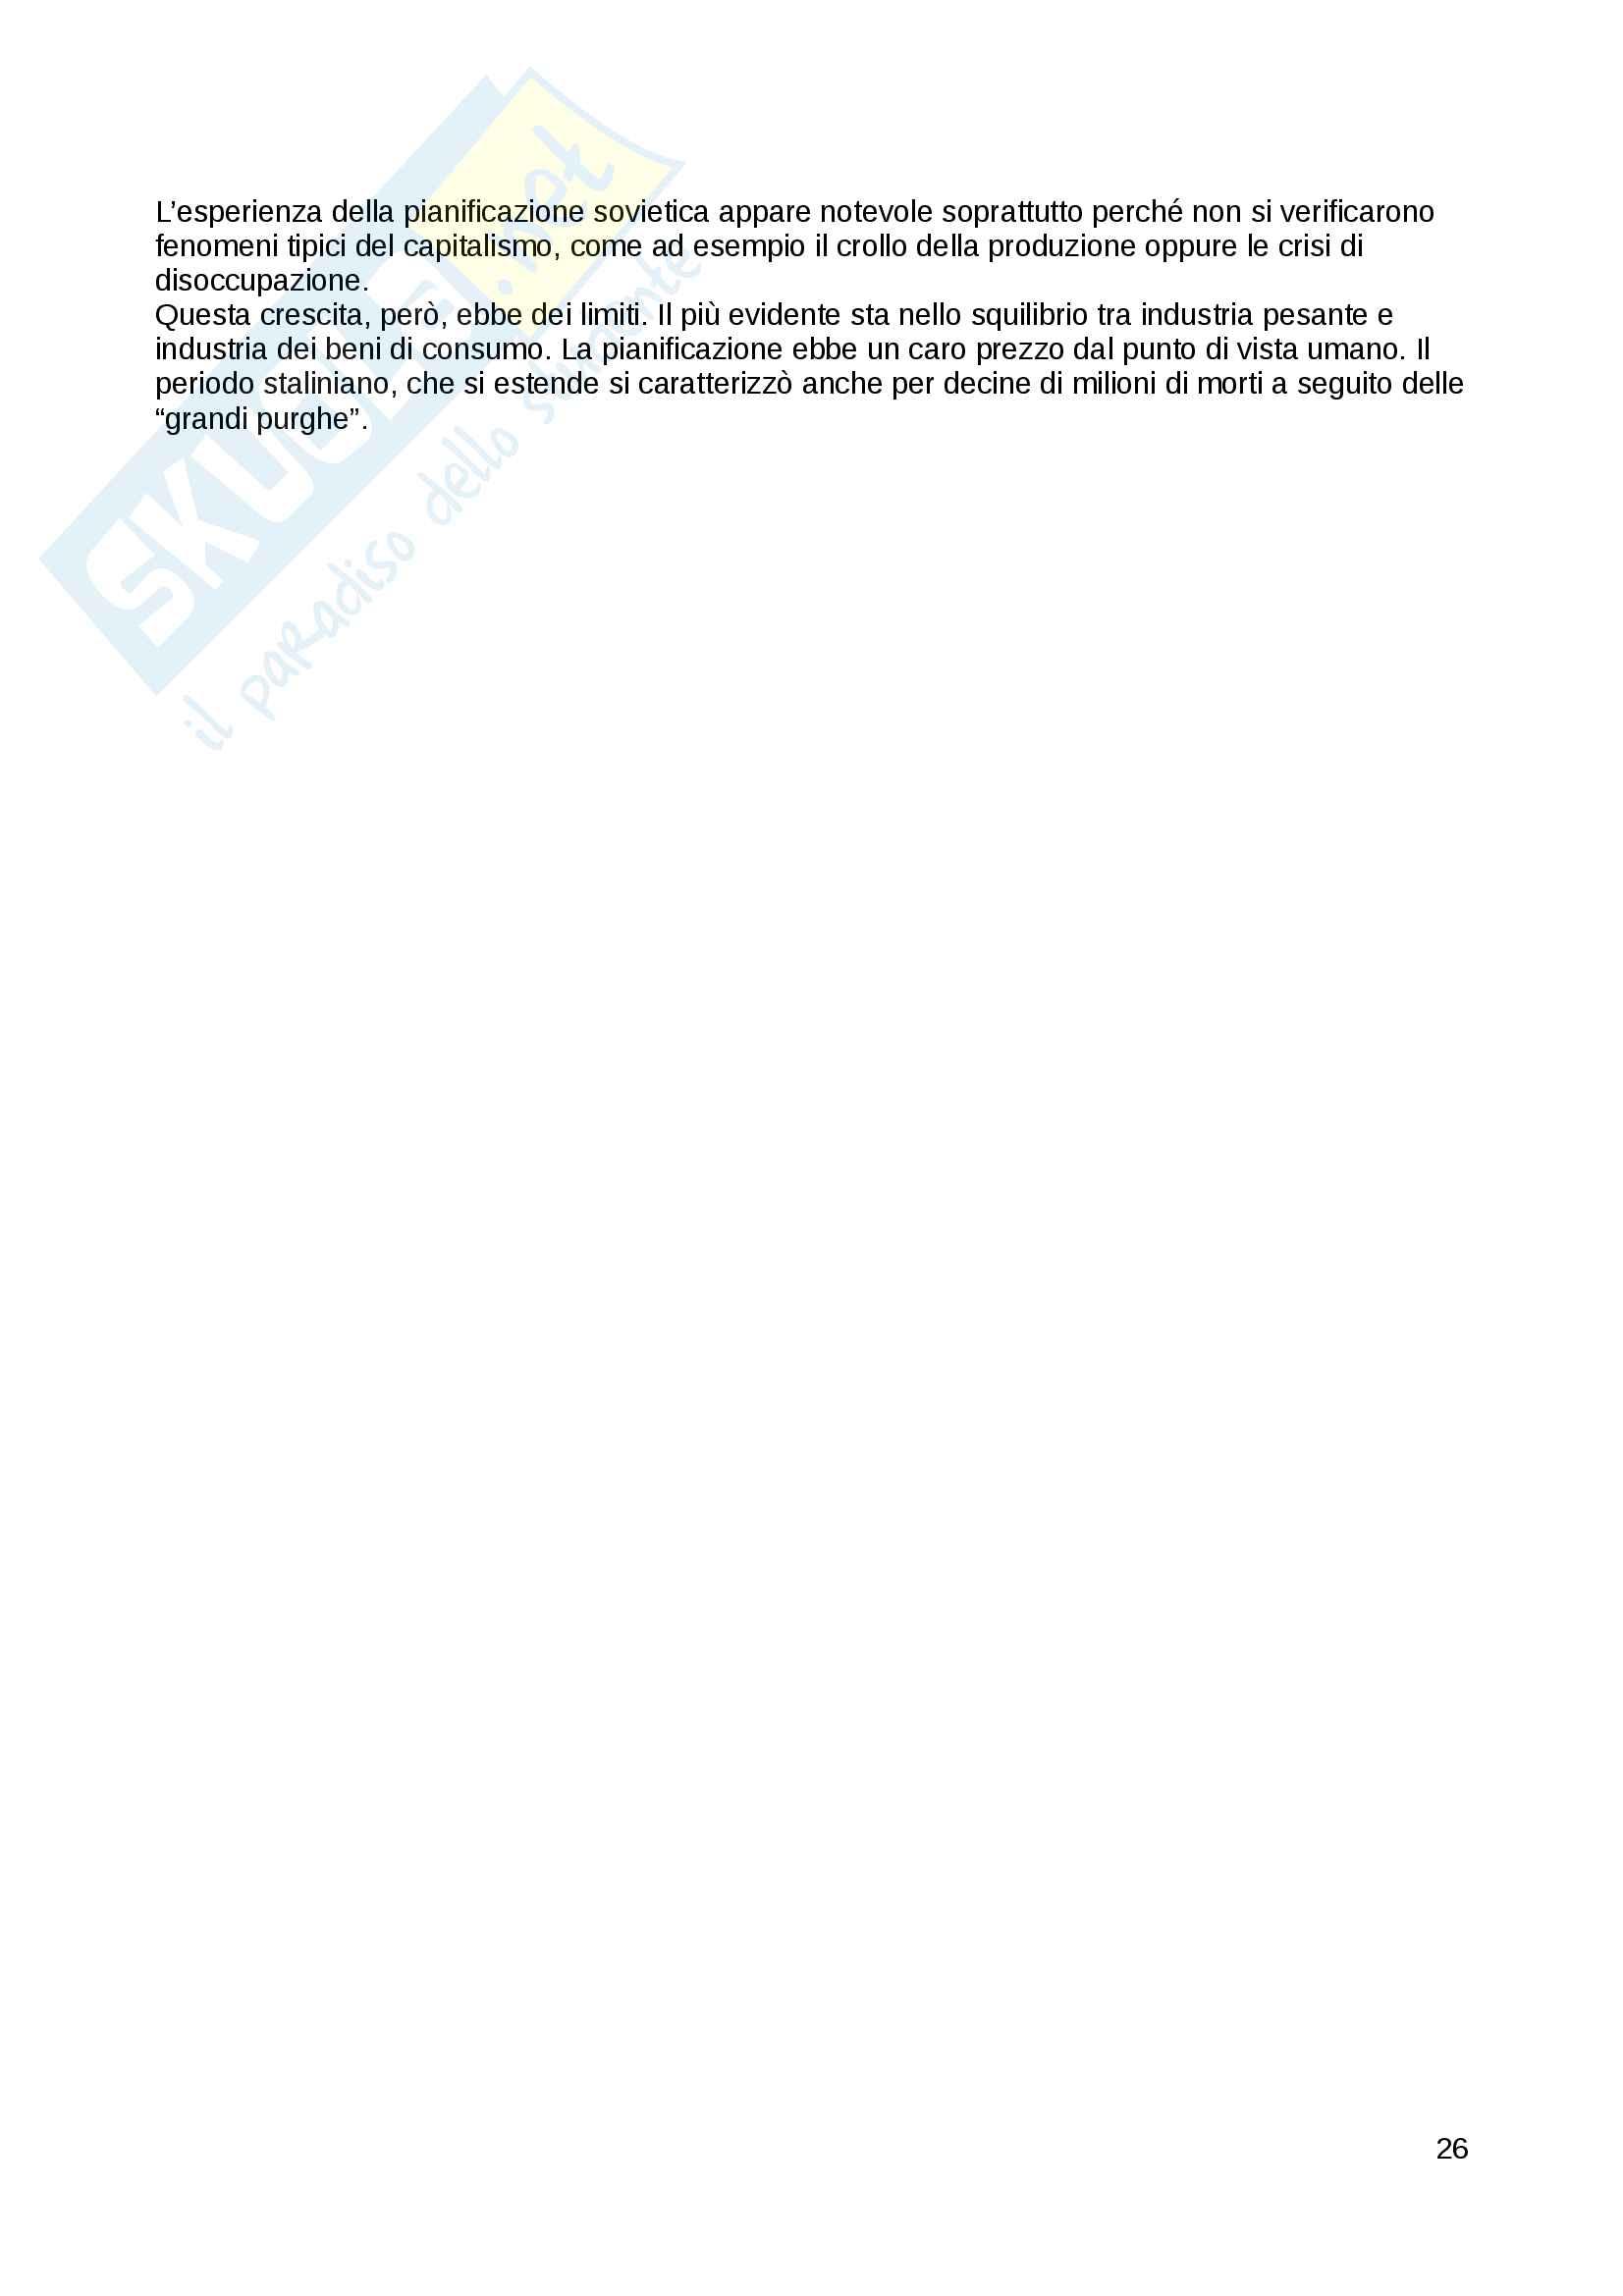 Domande Storia economica Pag. 26